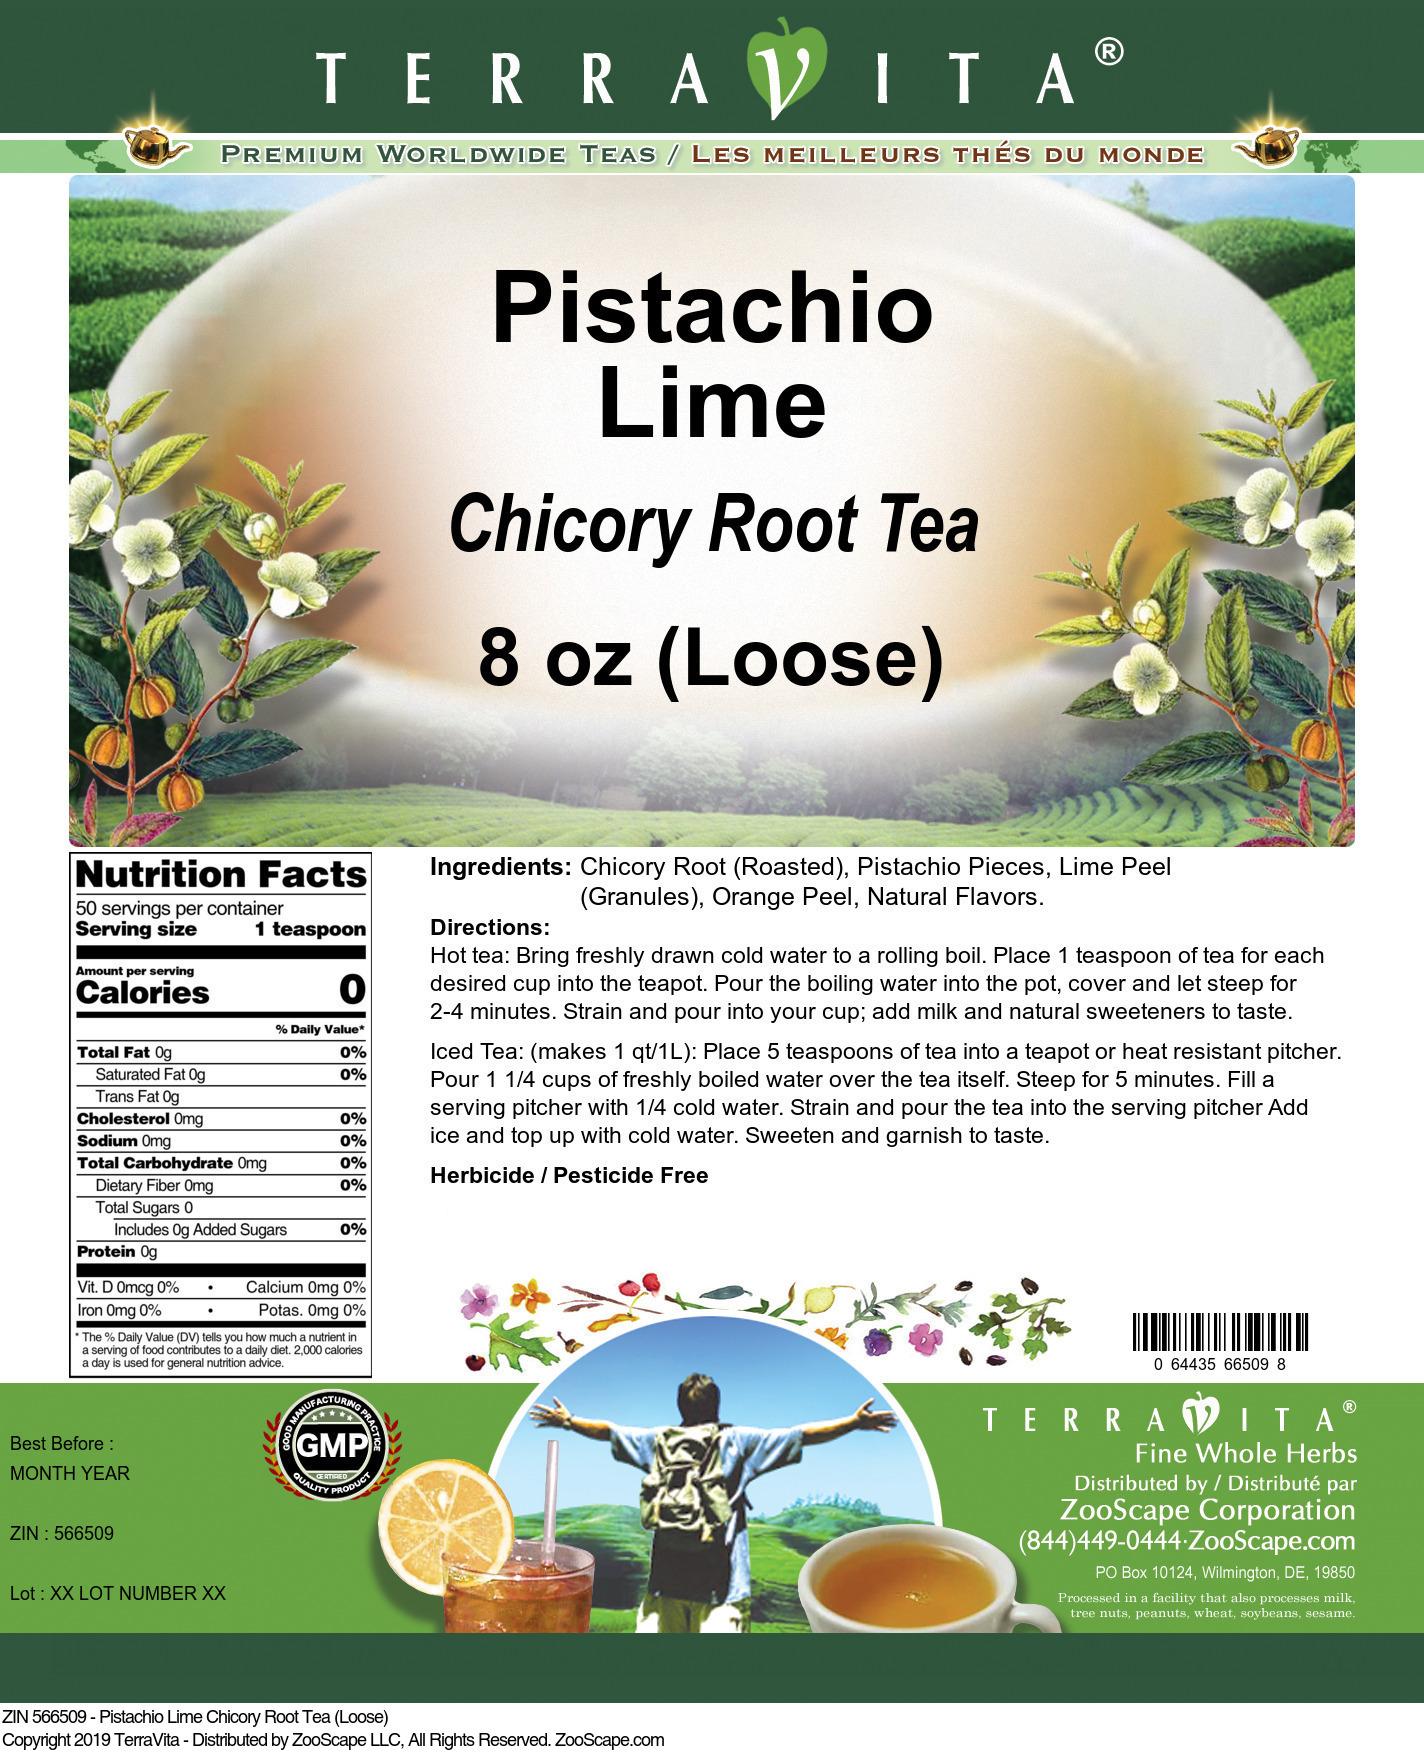 Pistachio Lime Chicory Root Tea (Loose)